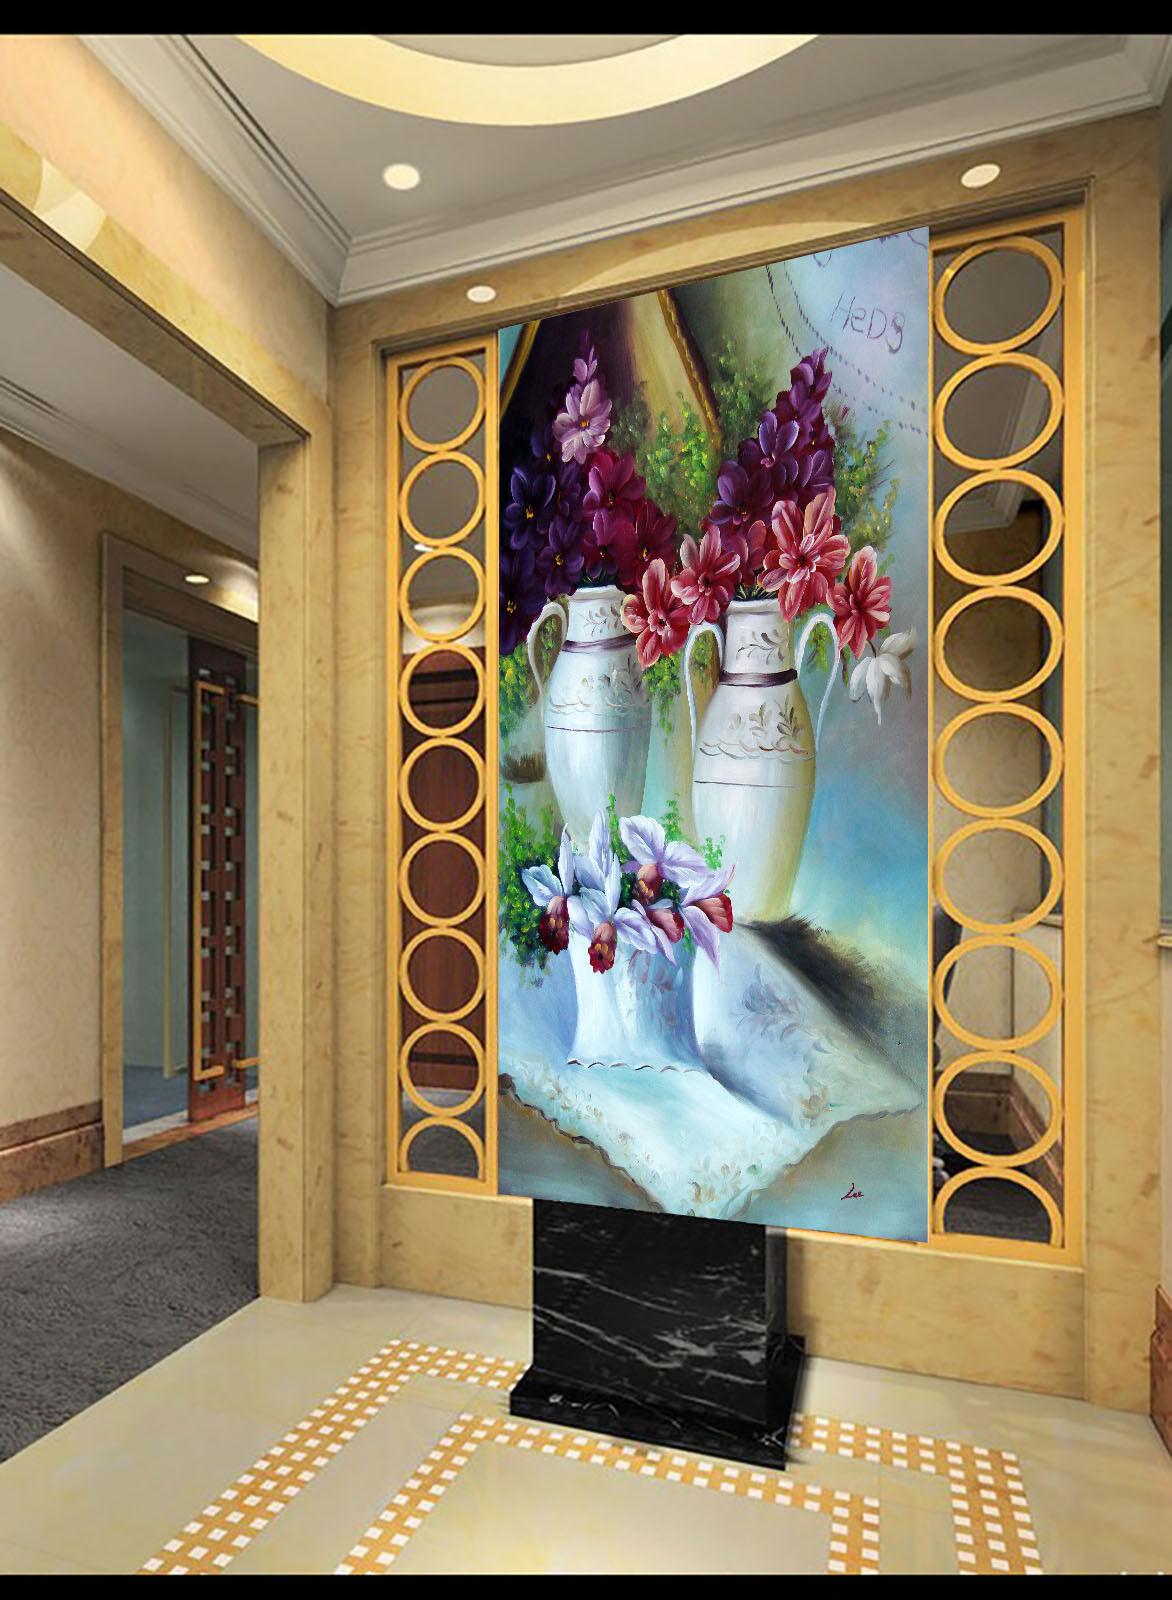 3D Petal Vase 511 Wallpaper Murals Wall Print Wall Mural AJ WALLPAPER UK Jenny